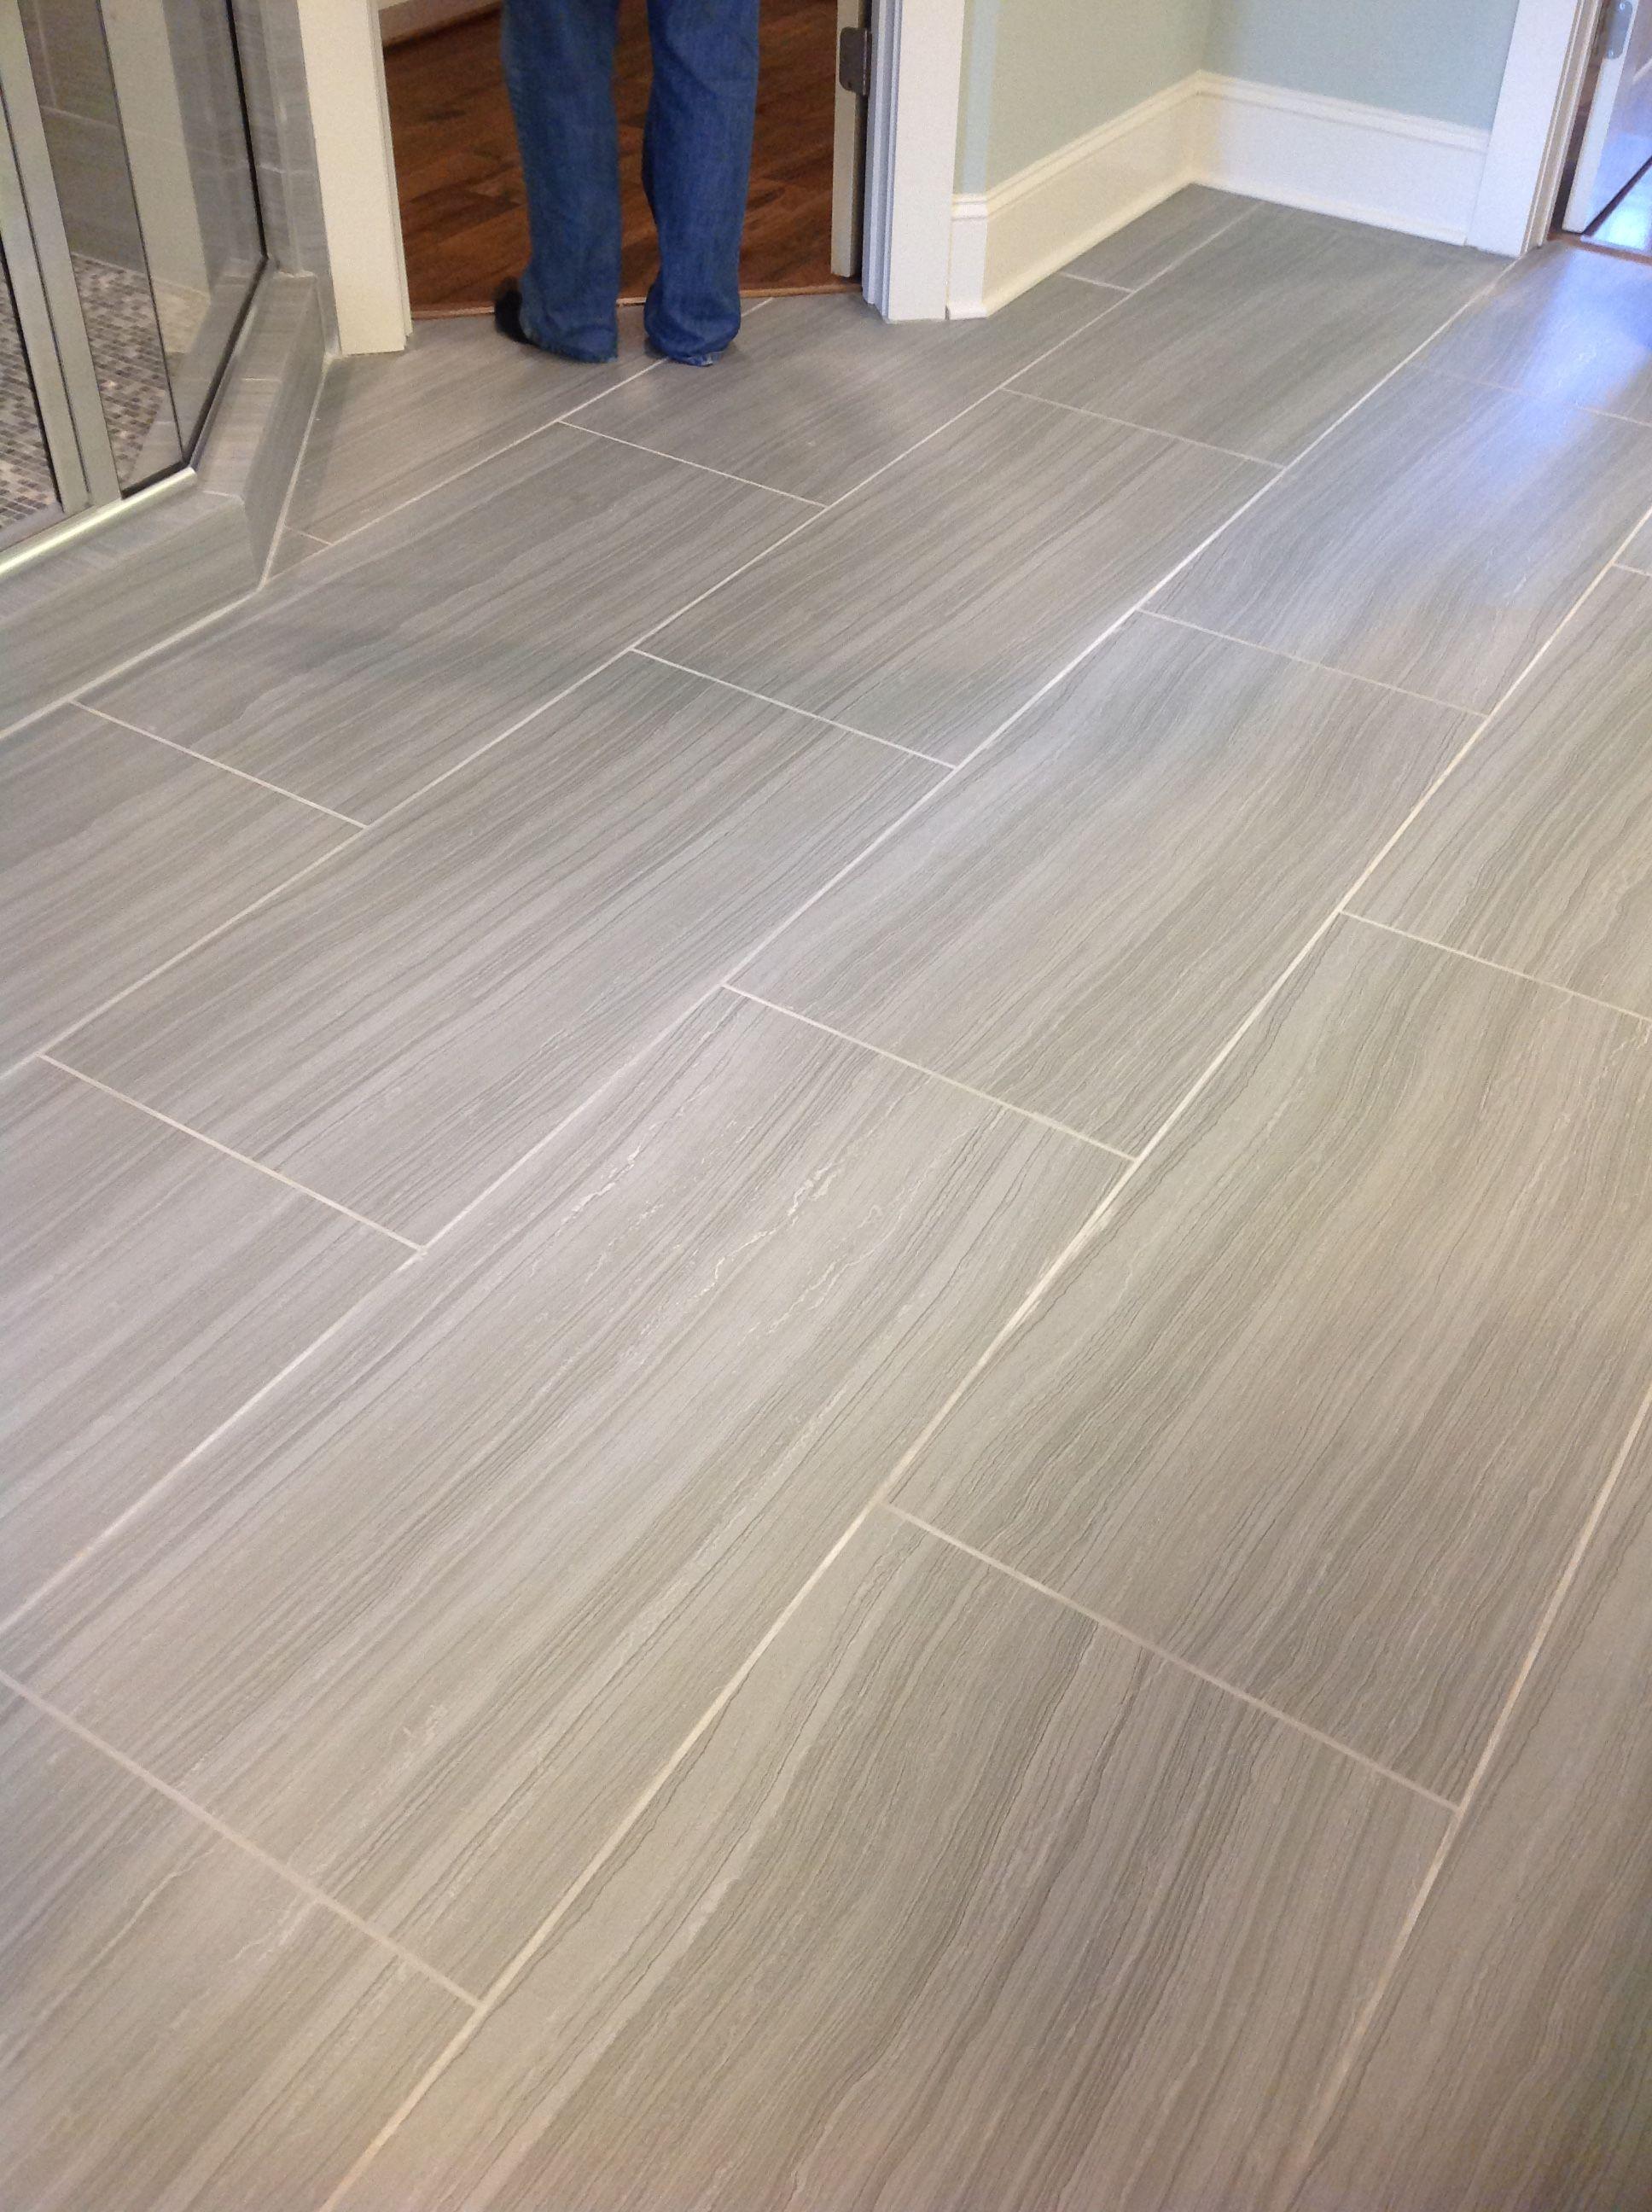 Pin By Crystal Evans On Next House Bathroom Flooring House Plans Flooring